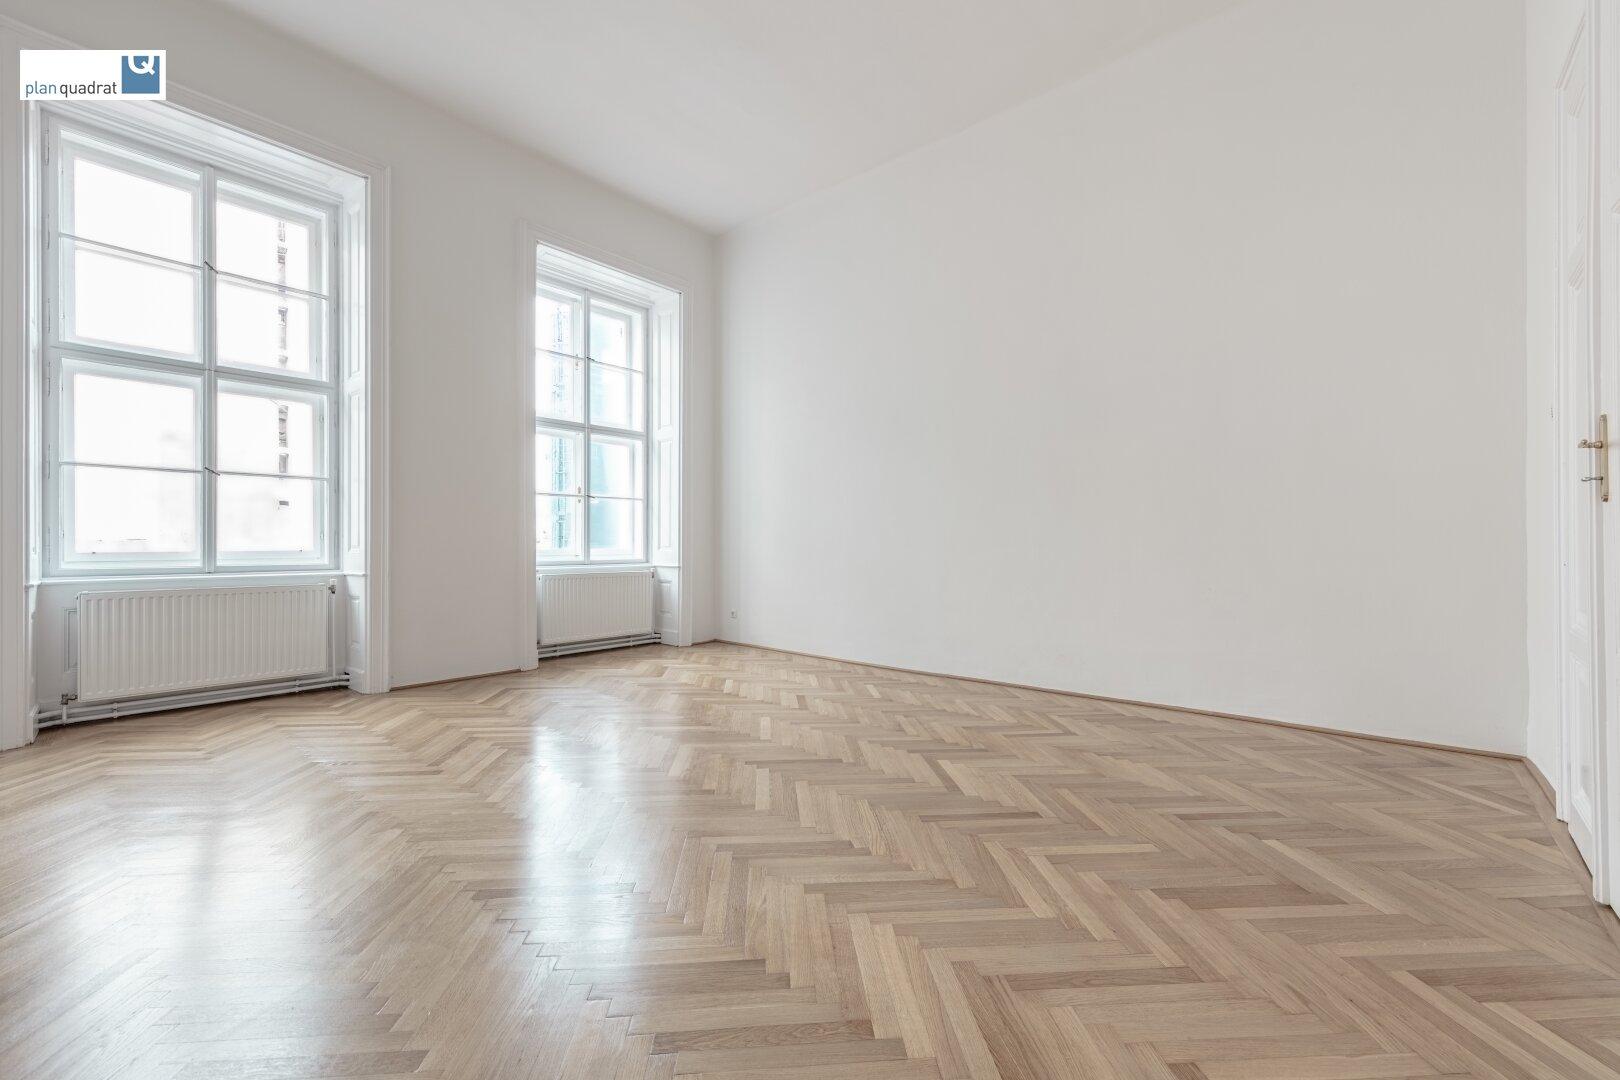 Zimmer 1 (ca. 28,20 m²) gem. Grundriss